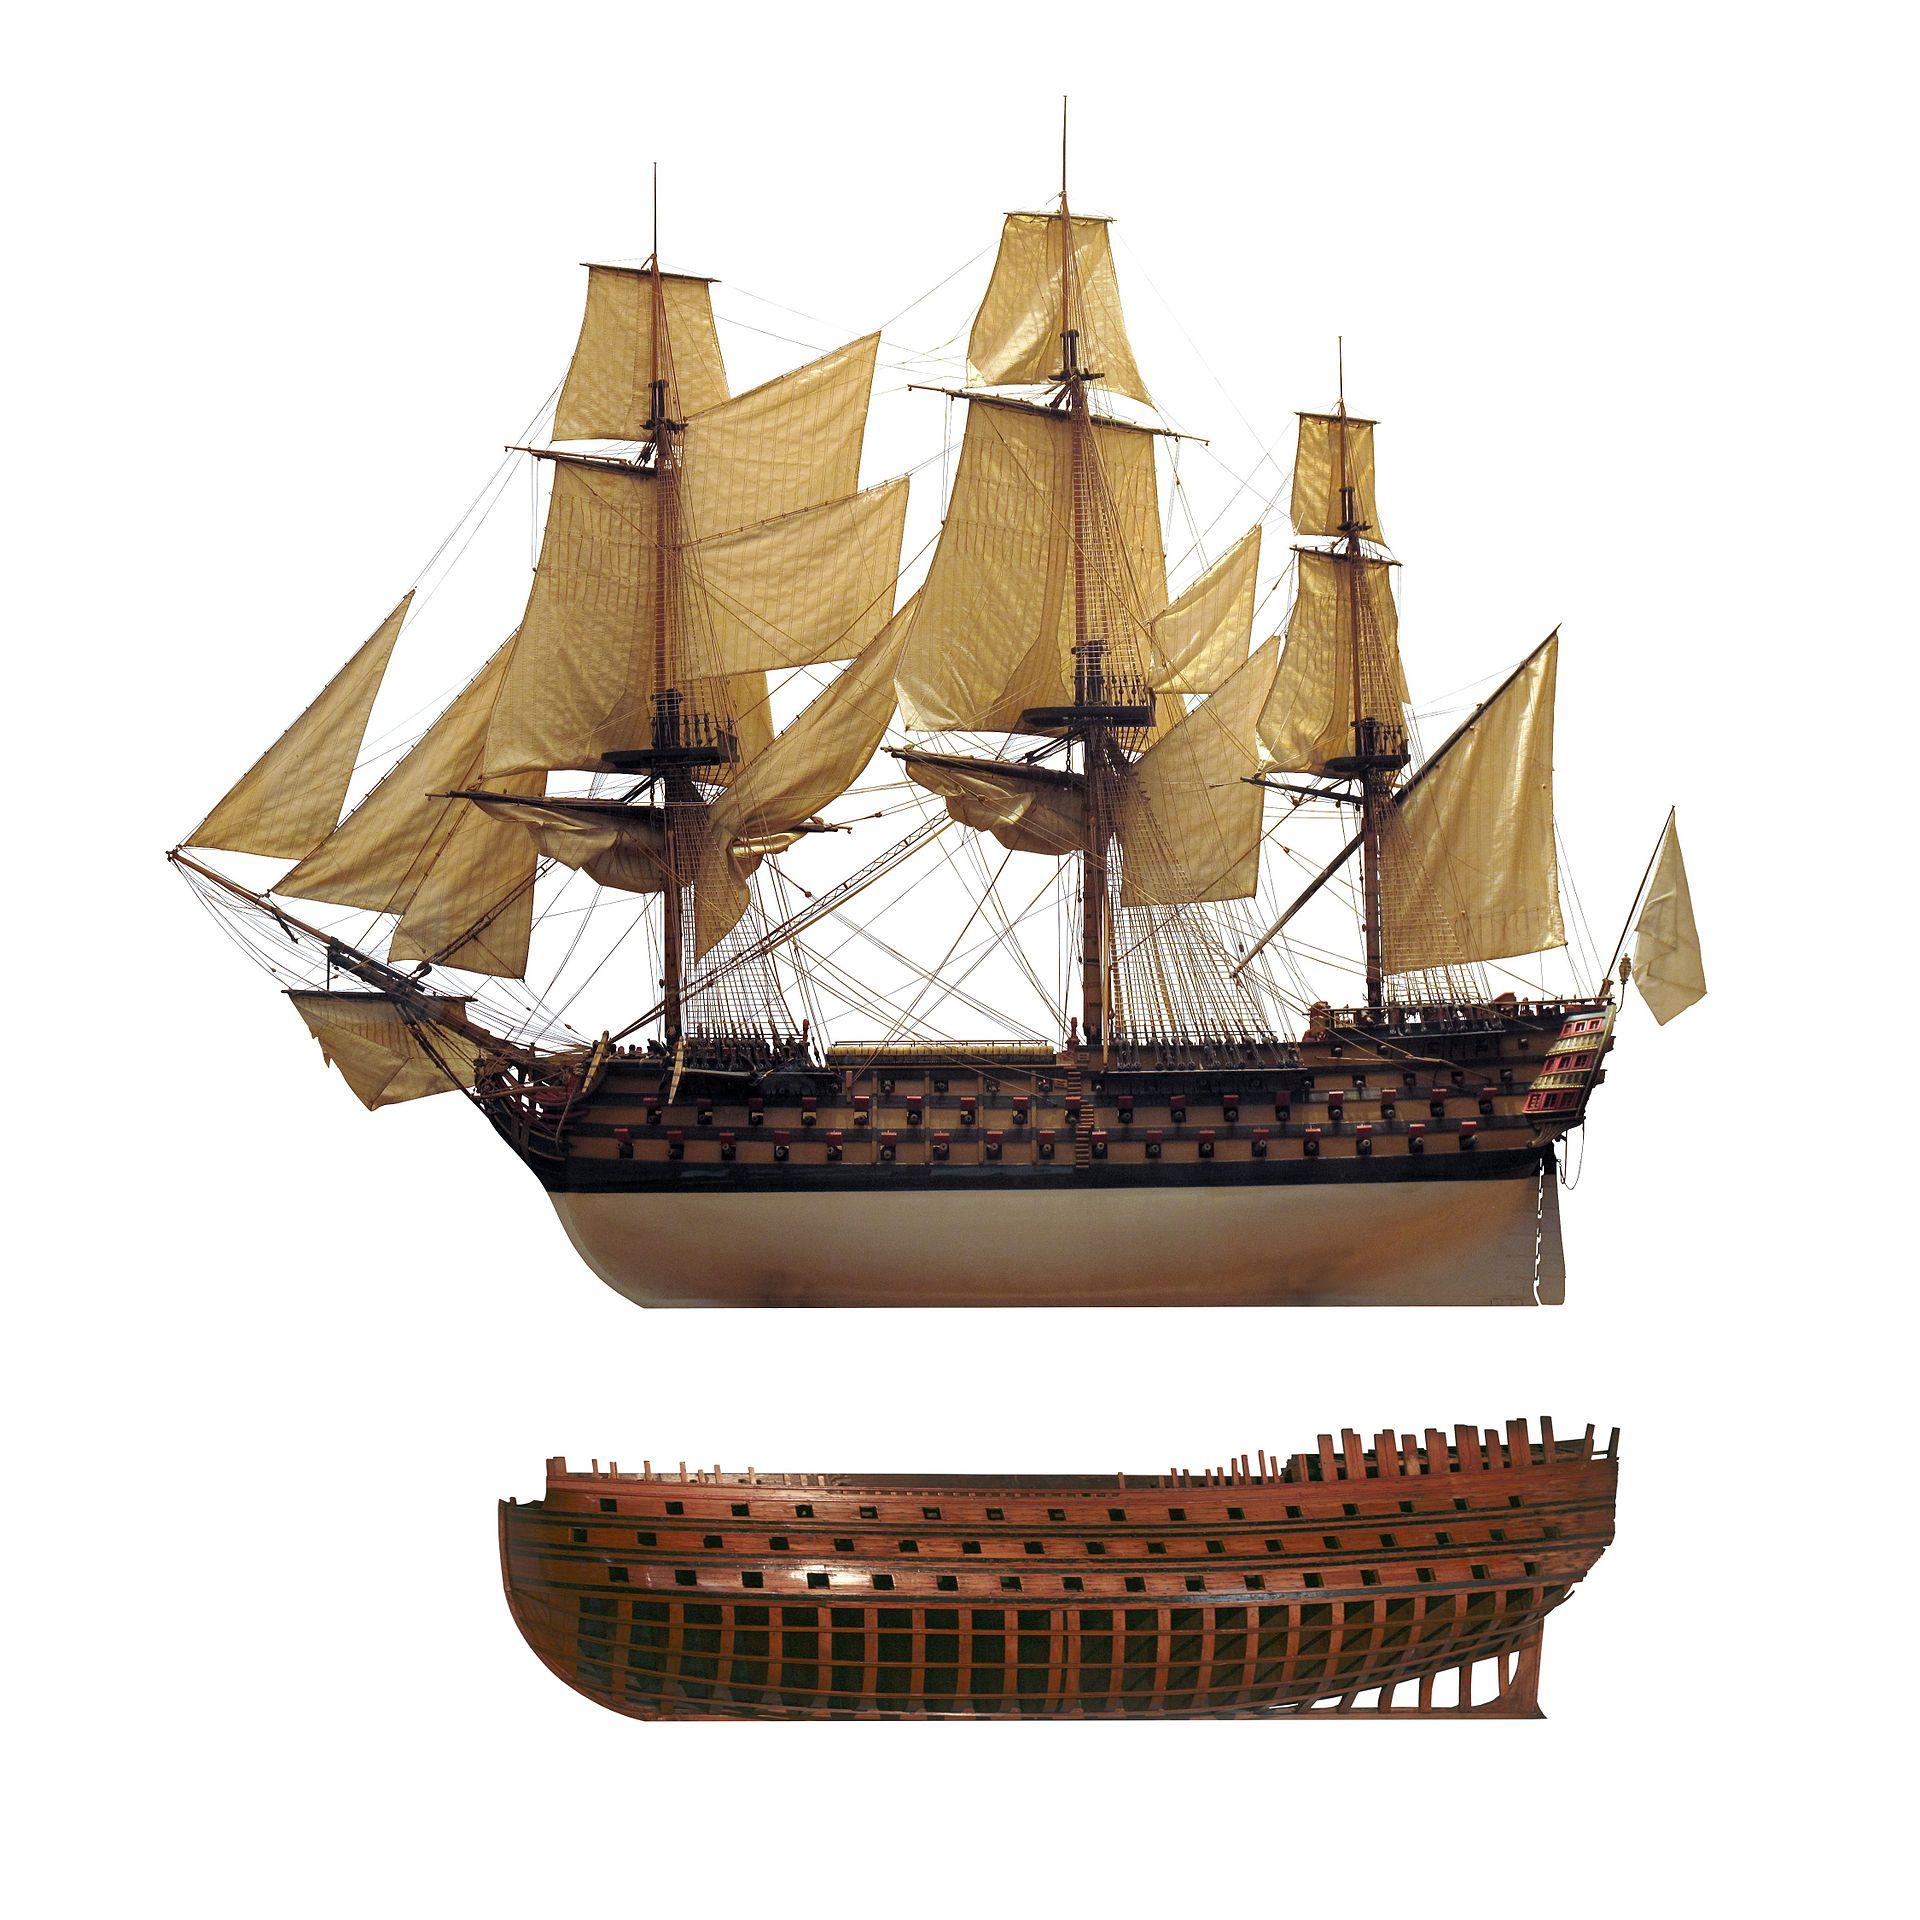 Océan-class ship of the line - Wikipedia